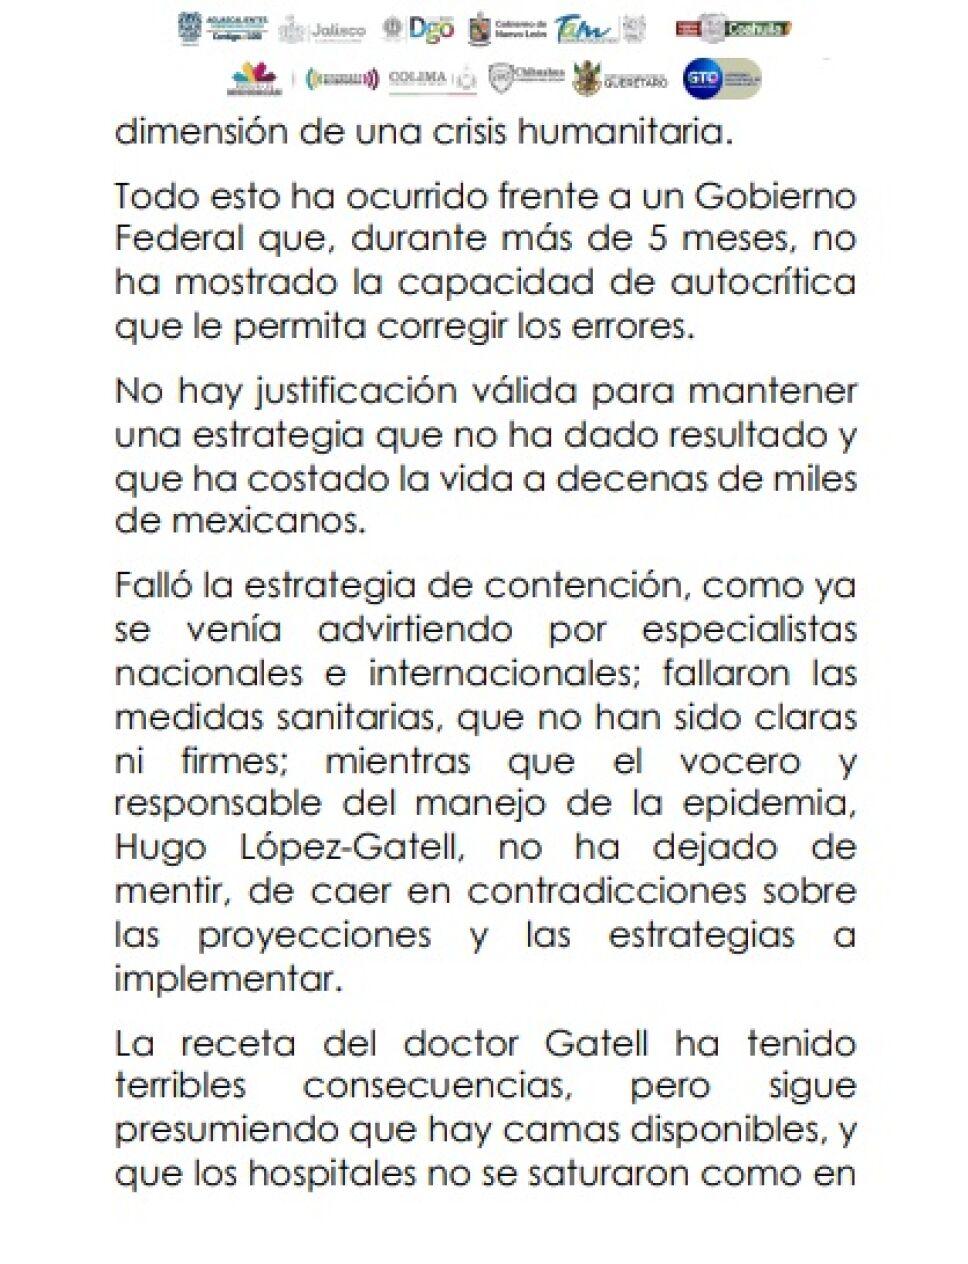 Exigen gobernadores renuncia inmediata de López-Gatell (2)